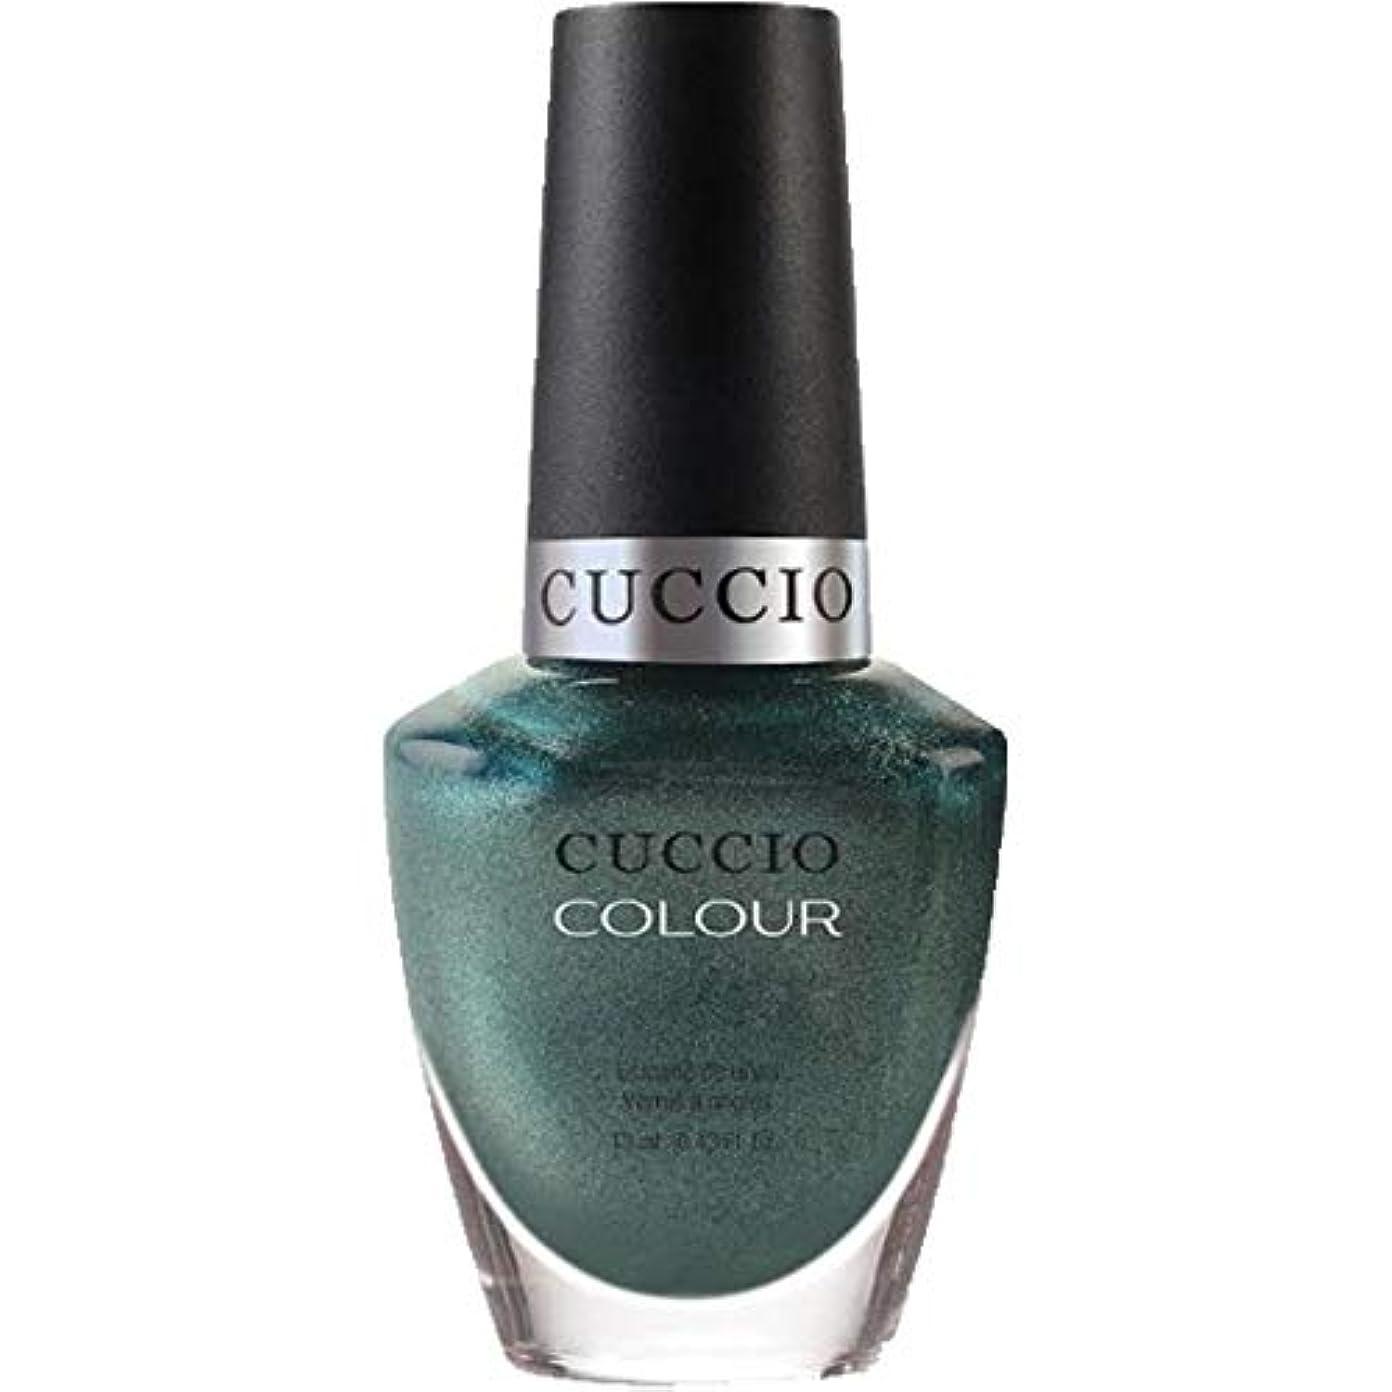 Cuccio Colour Gloss Lacquer - Notorious - 0.43oz / 13ml